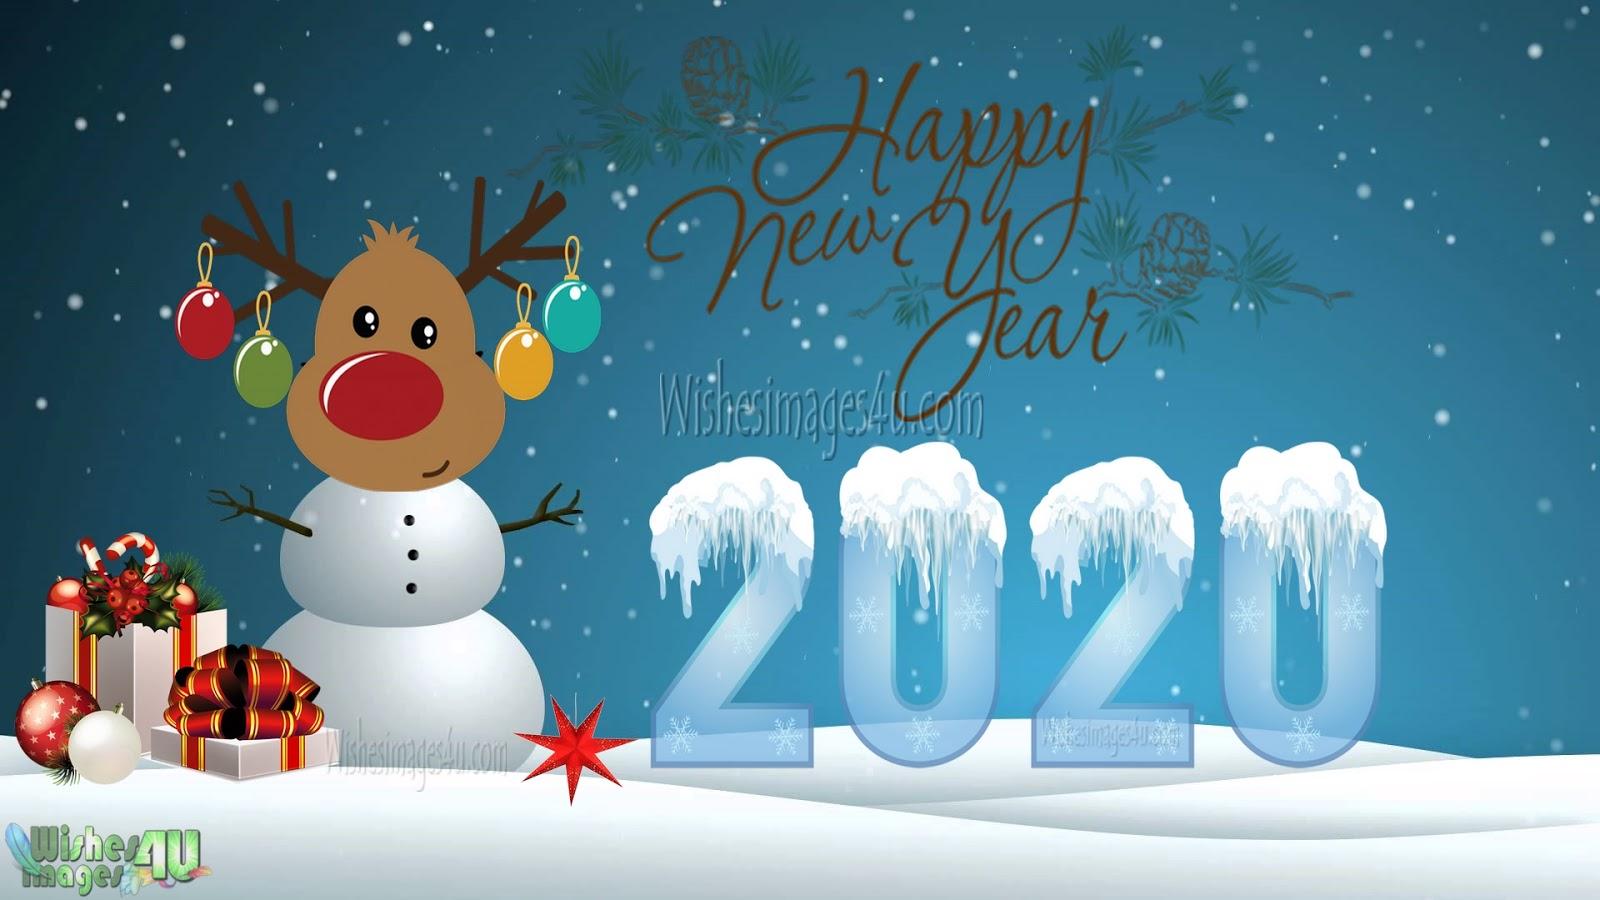 Free download Happy New Year 2020 1080p Full HD Wallpaper ...